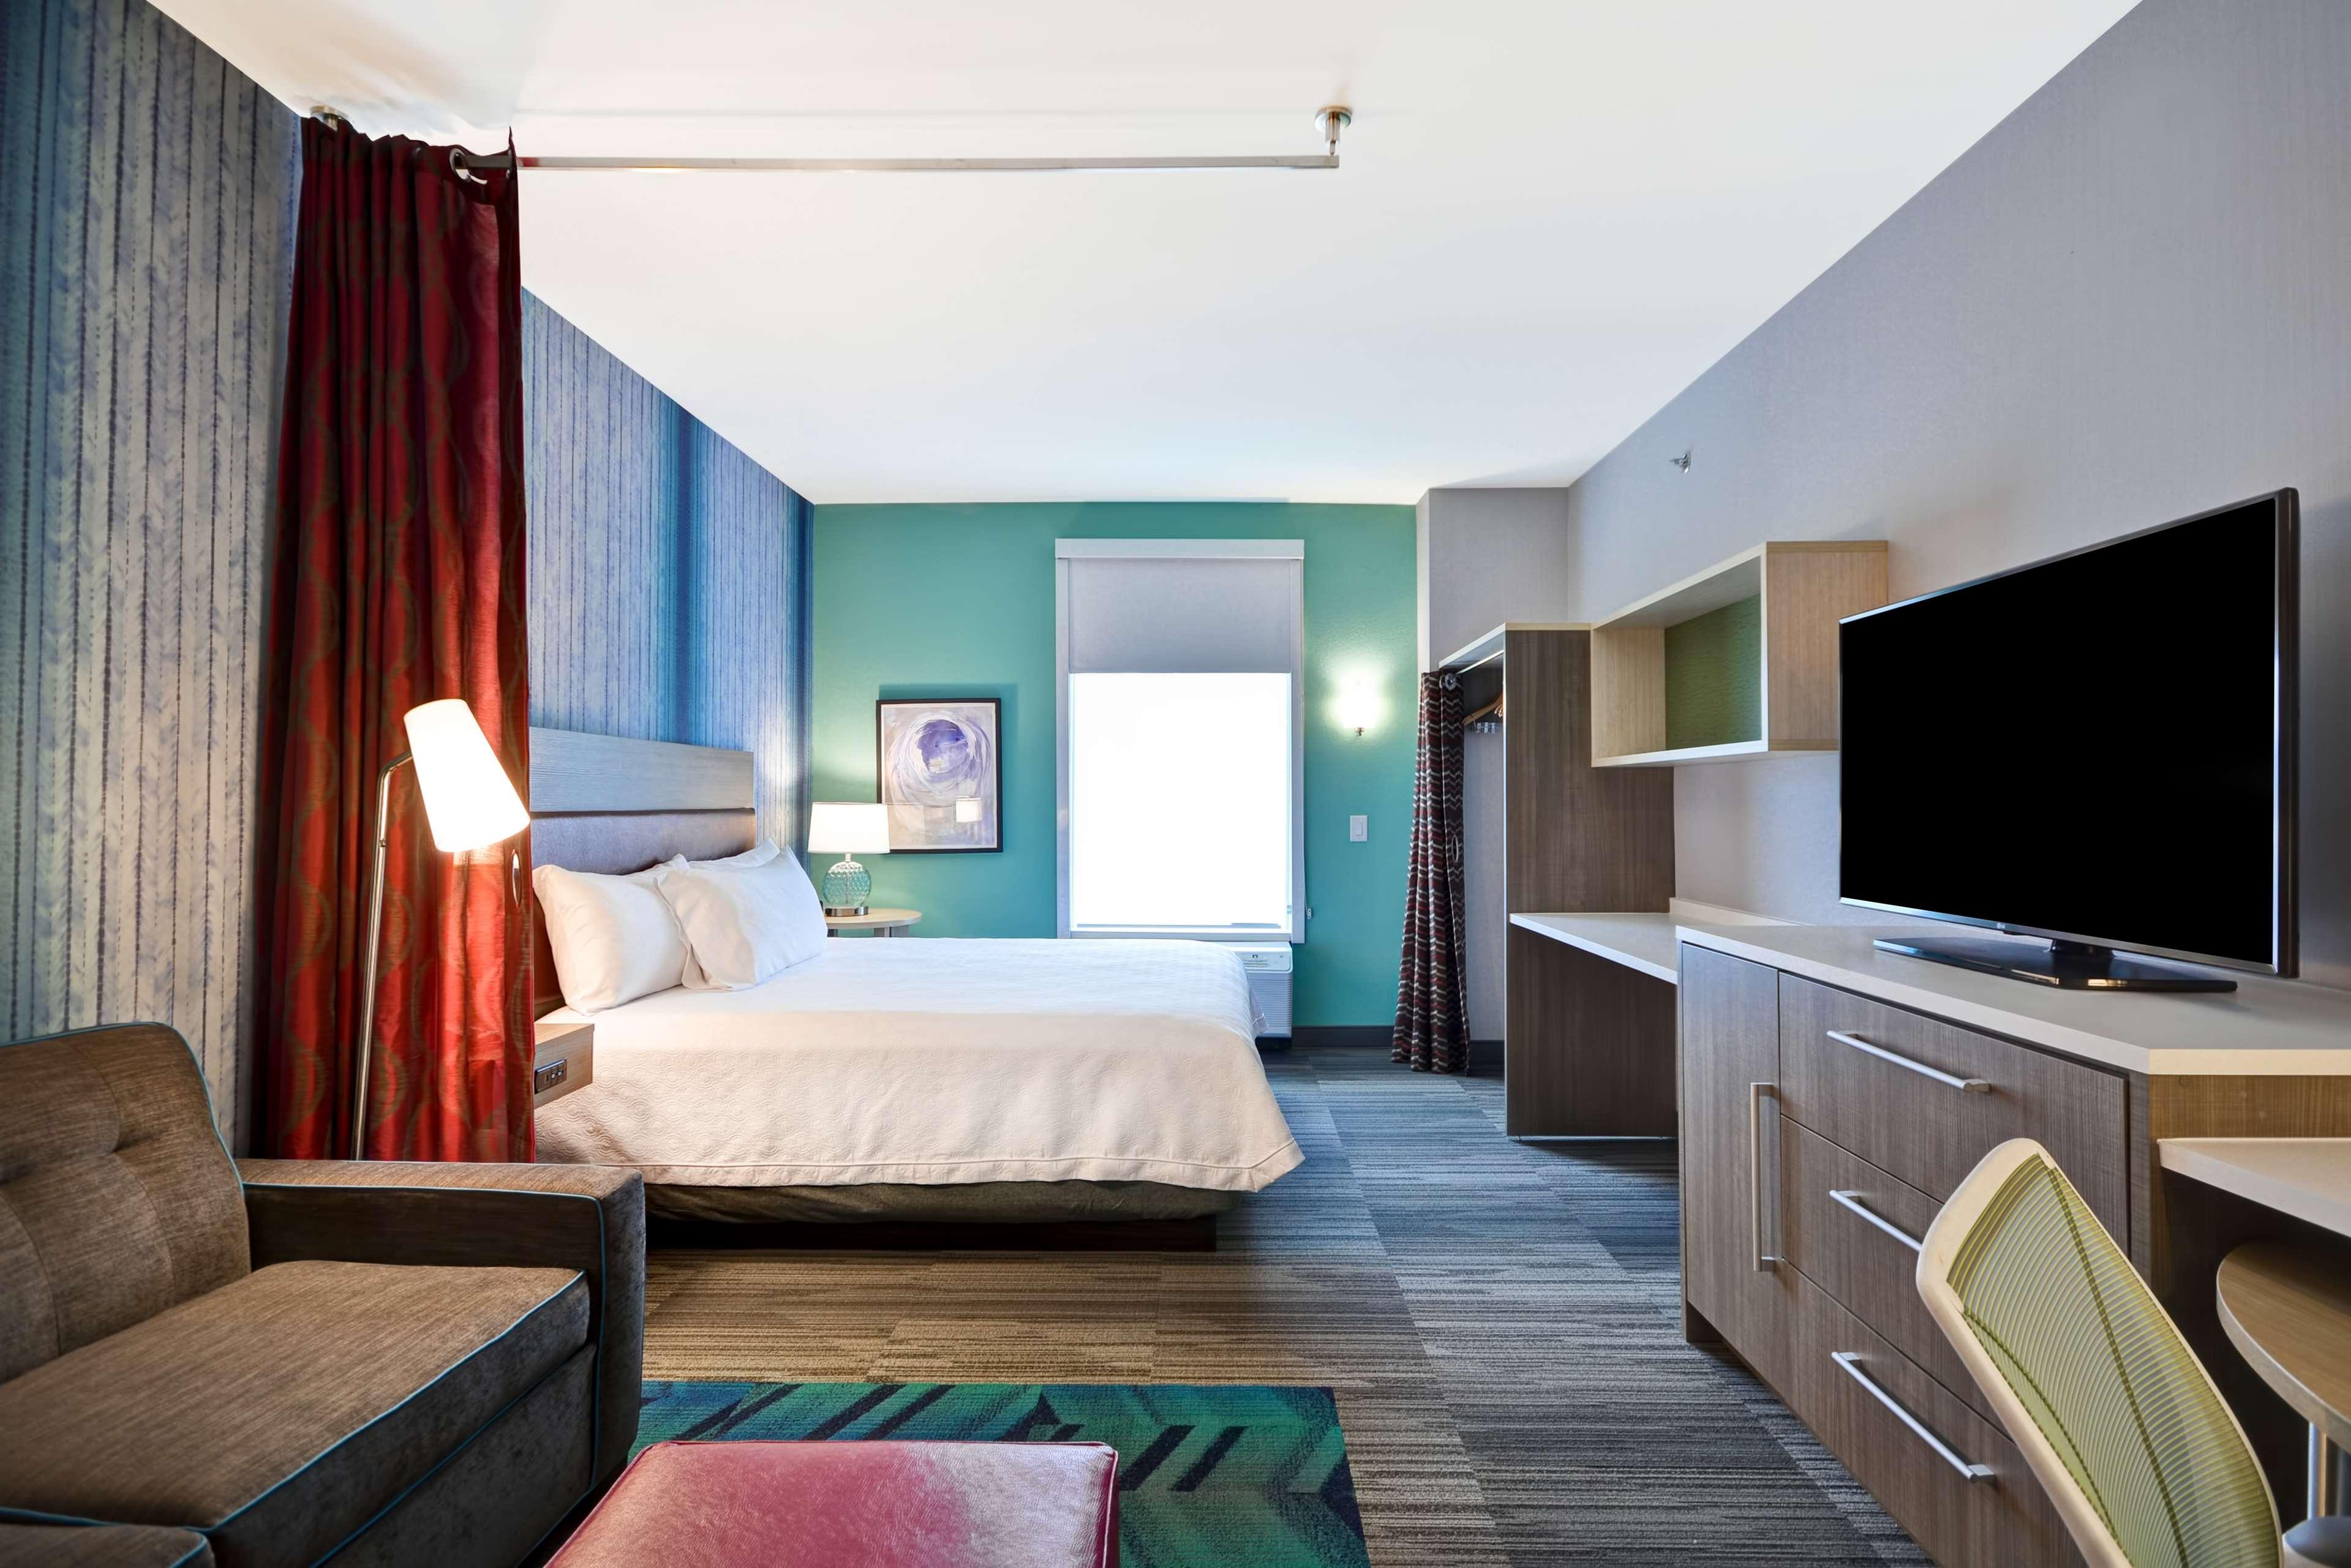 Home2 Suites by Hilton Atlanta West Lithia Springs image 25